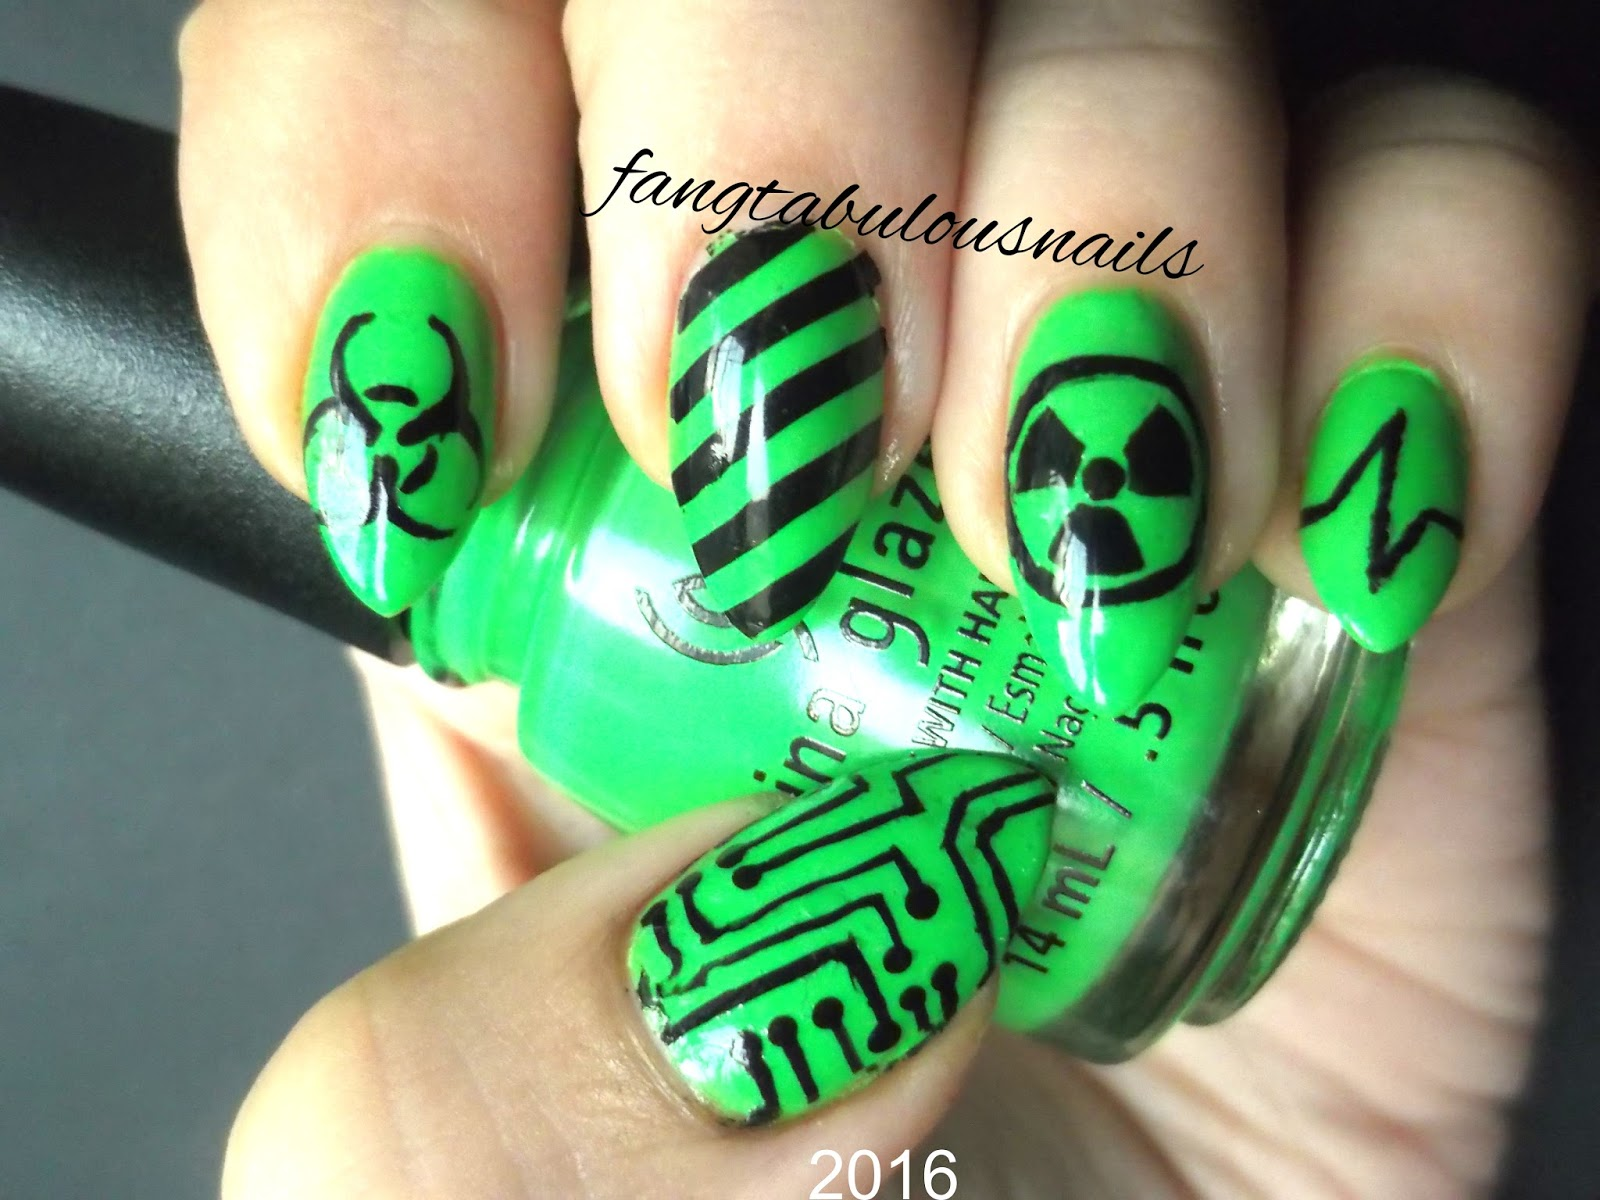 Fangtabulous nails: Cyber Goth